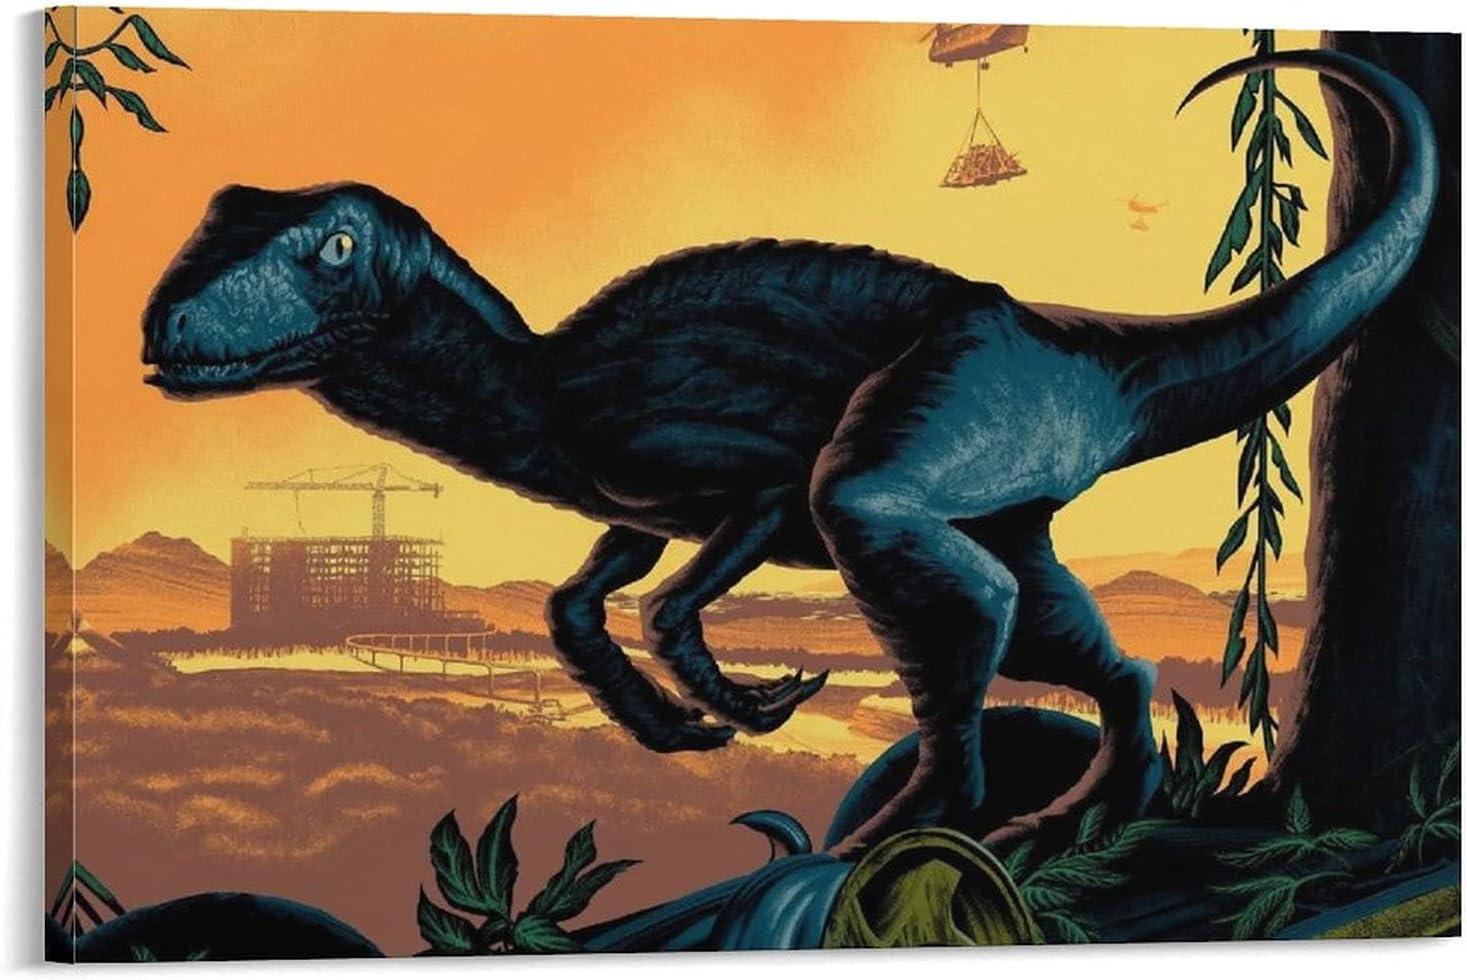 CONYASK Dinosaur Tyrannosaurus Velociraptor Cheap bargain High material Egg P Thief Poster 8